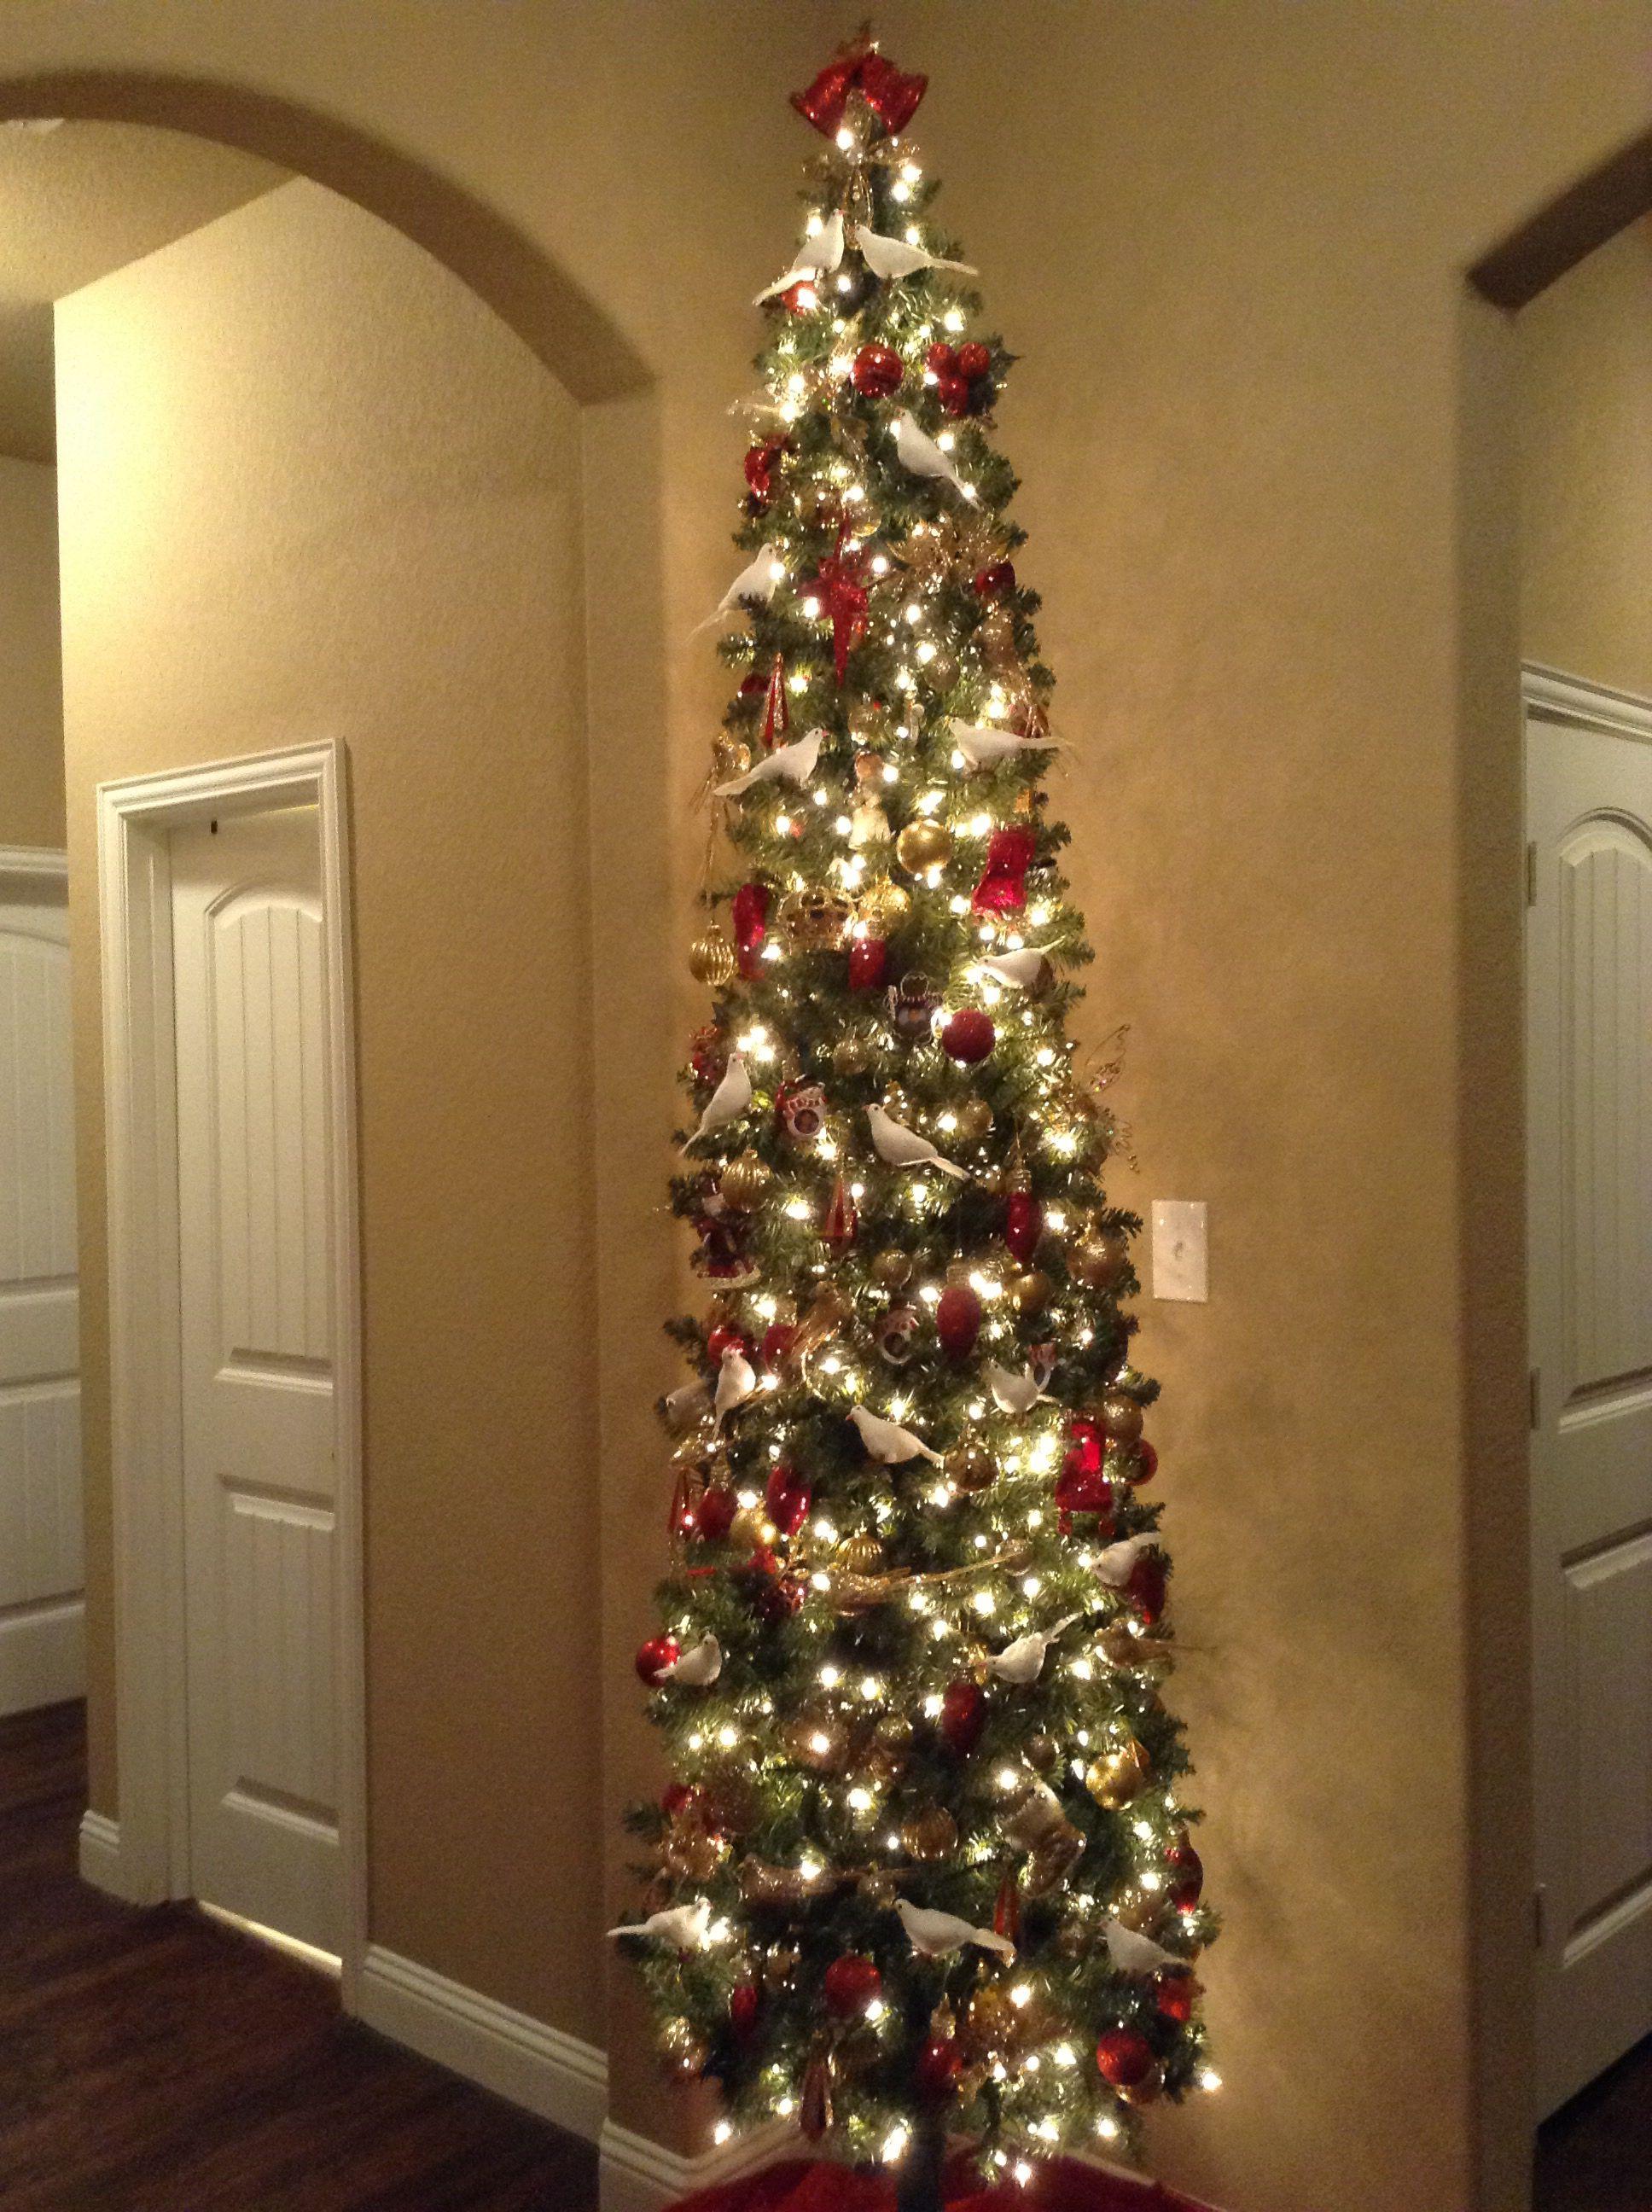 White dove christmas ornaments - Slim Christmas Tree Decoration Gold Red White Doves Ornaments